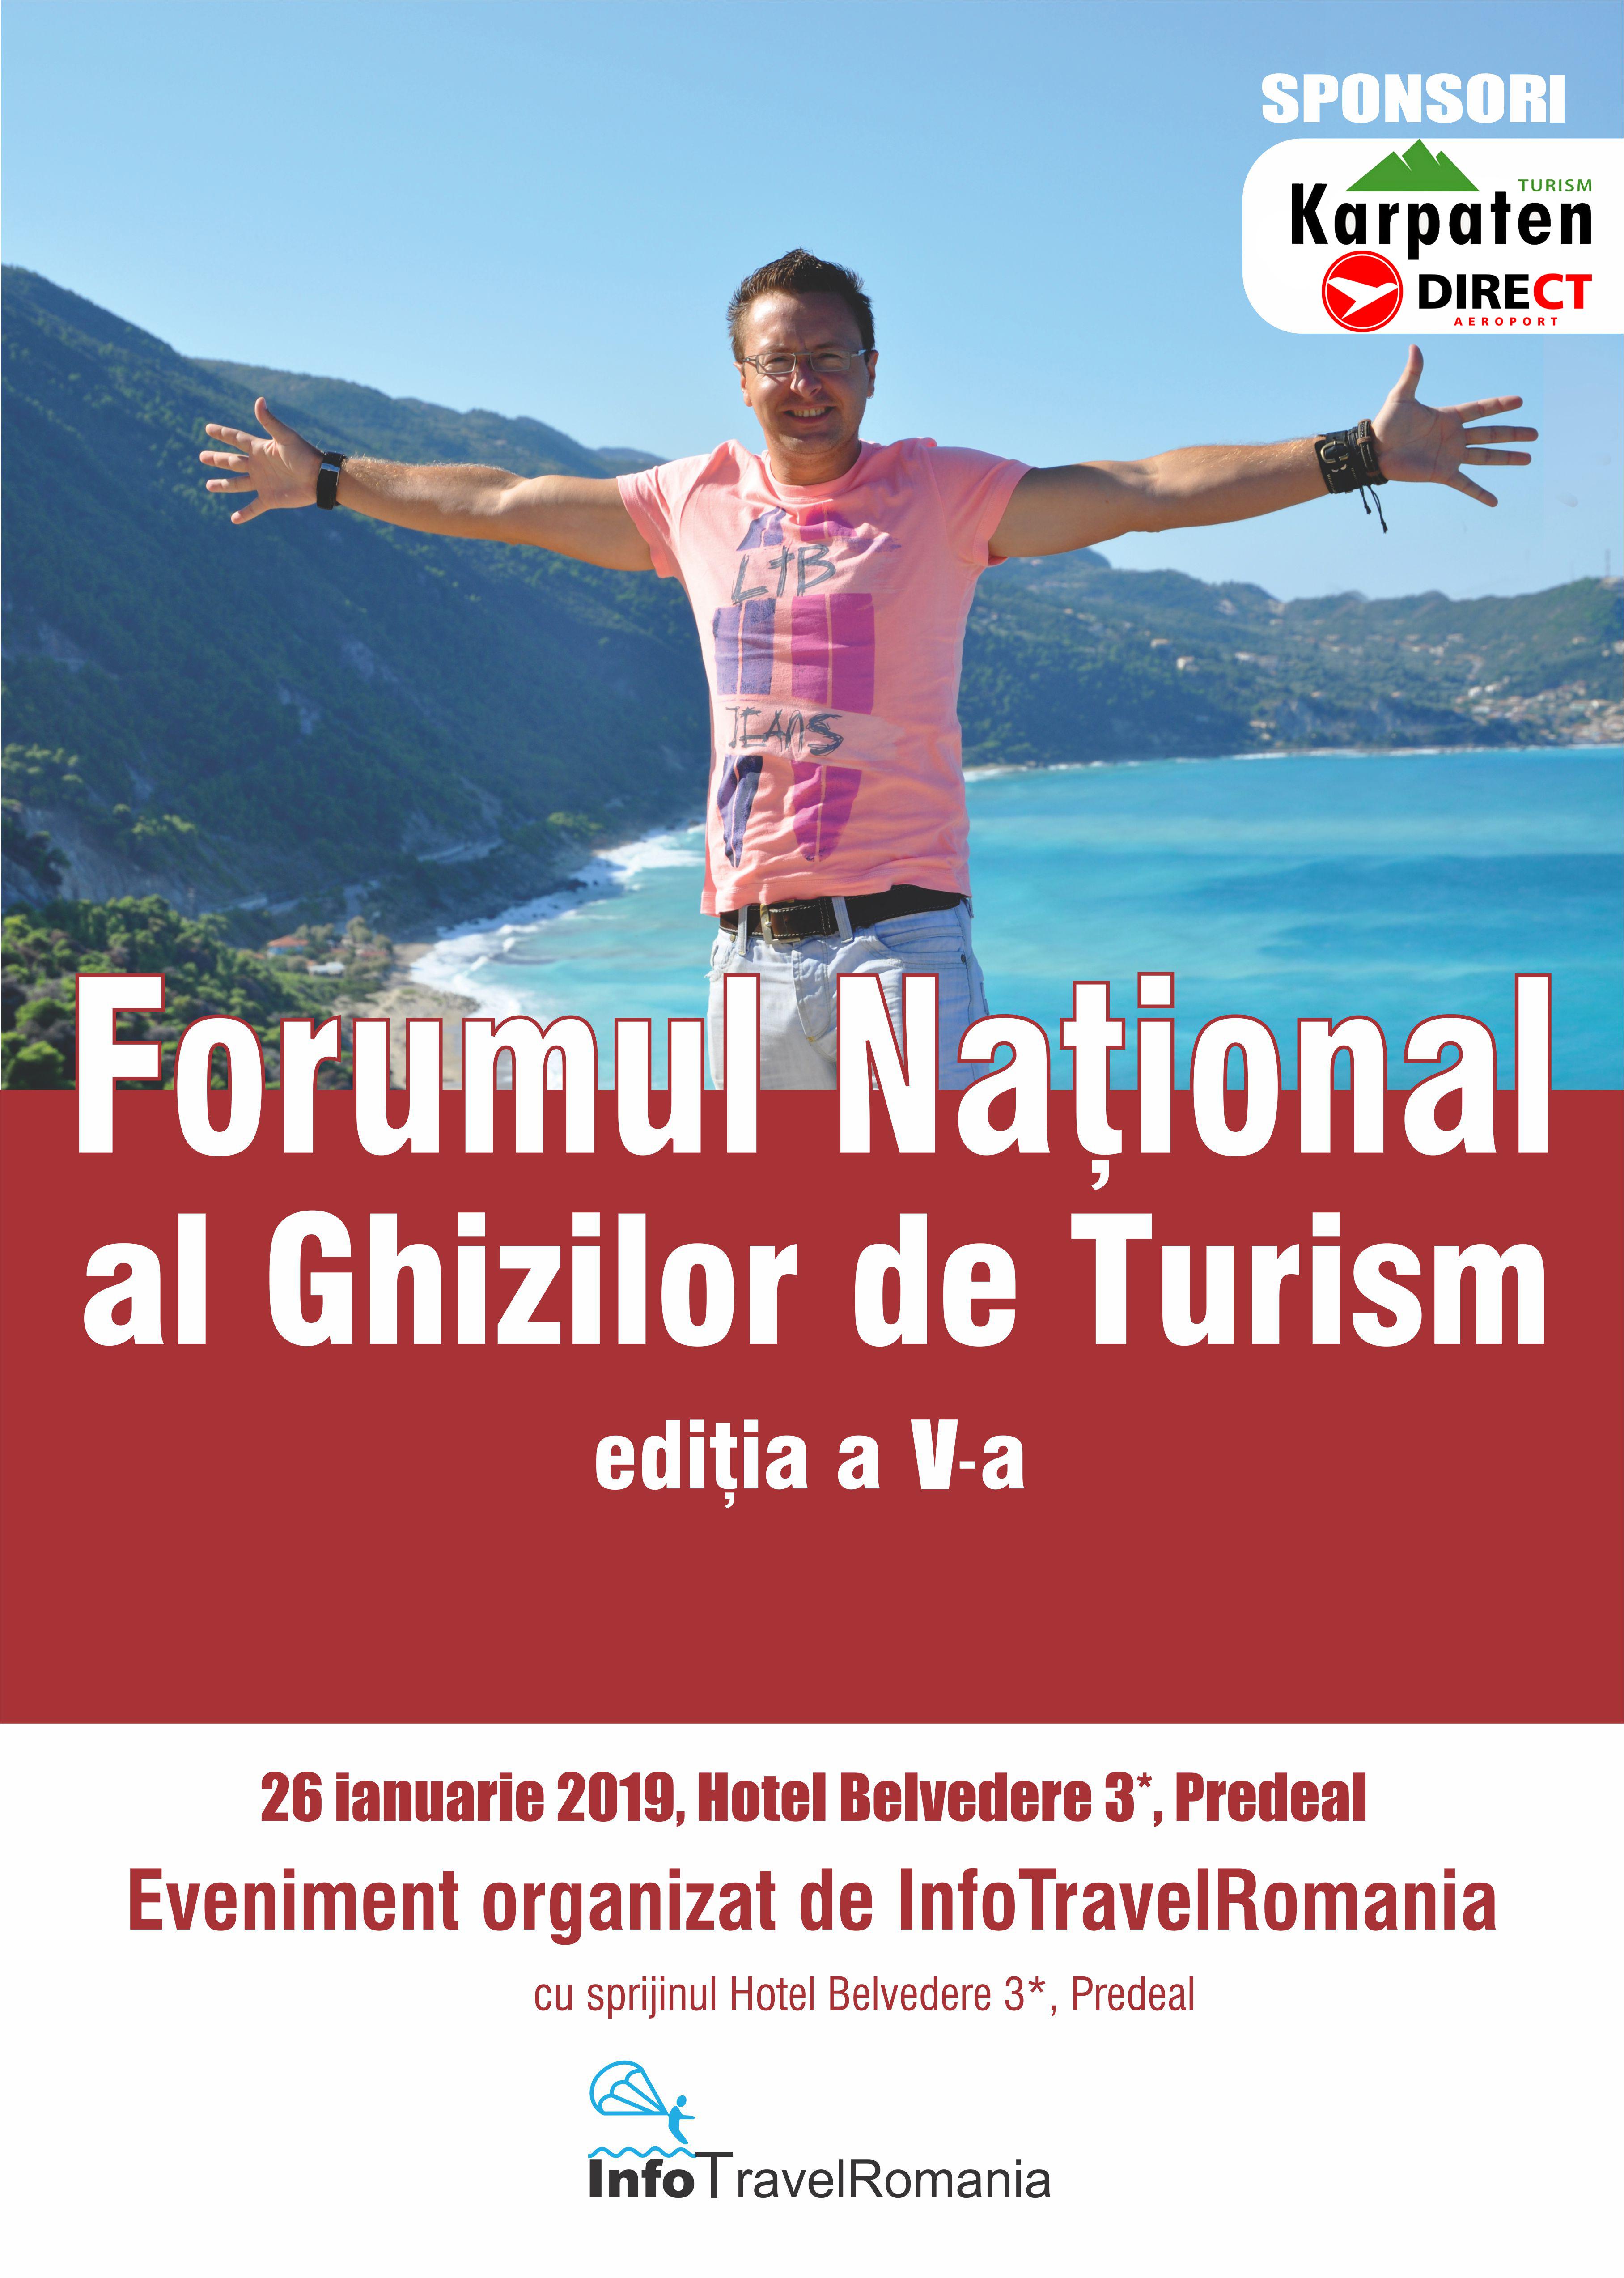 Forumul Ghizilor de Turism editia a V-a